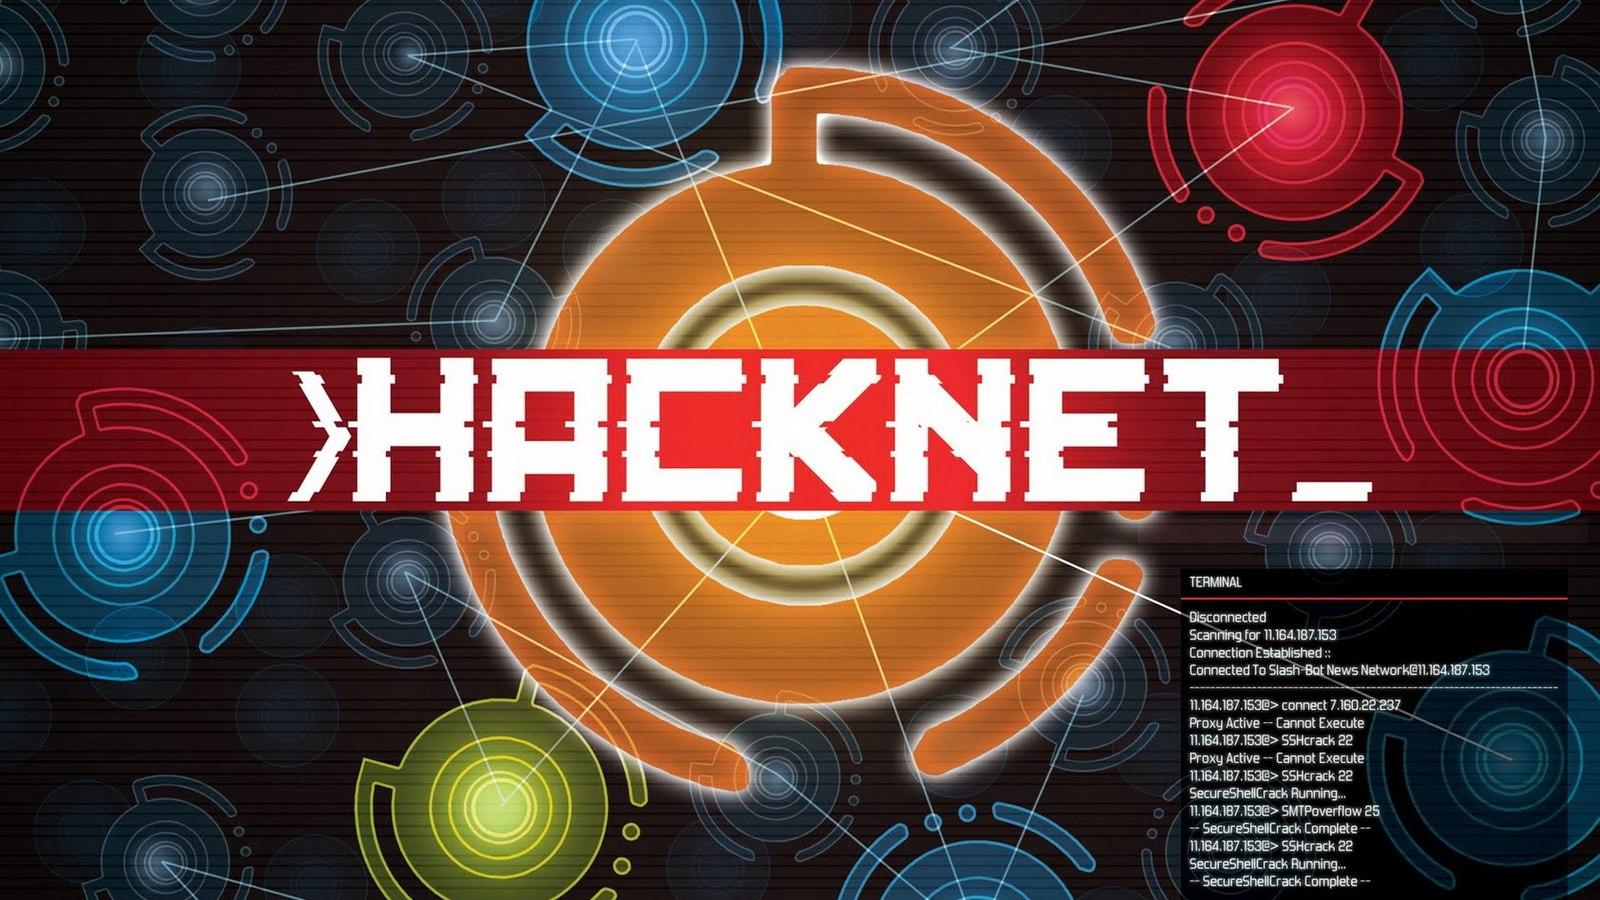 Hacknet (STEAM KEY/REGION FREE) 2019